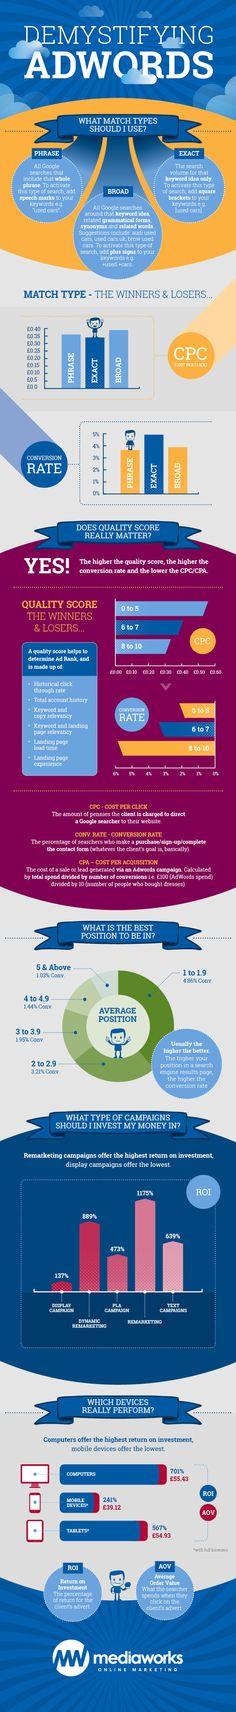 Demystifying Adwords #infografia #infographic #marketing